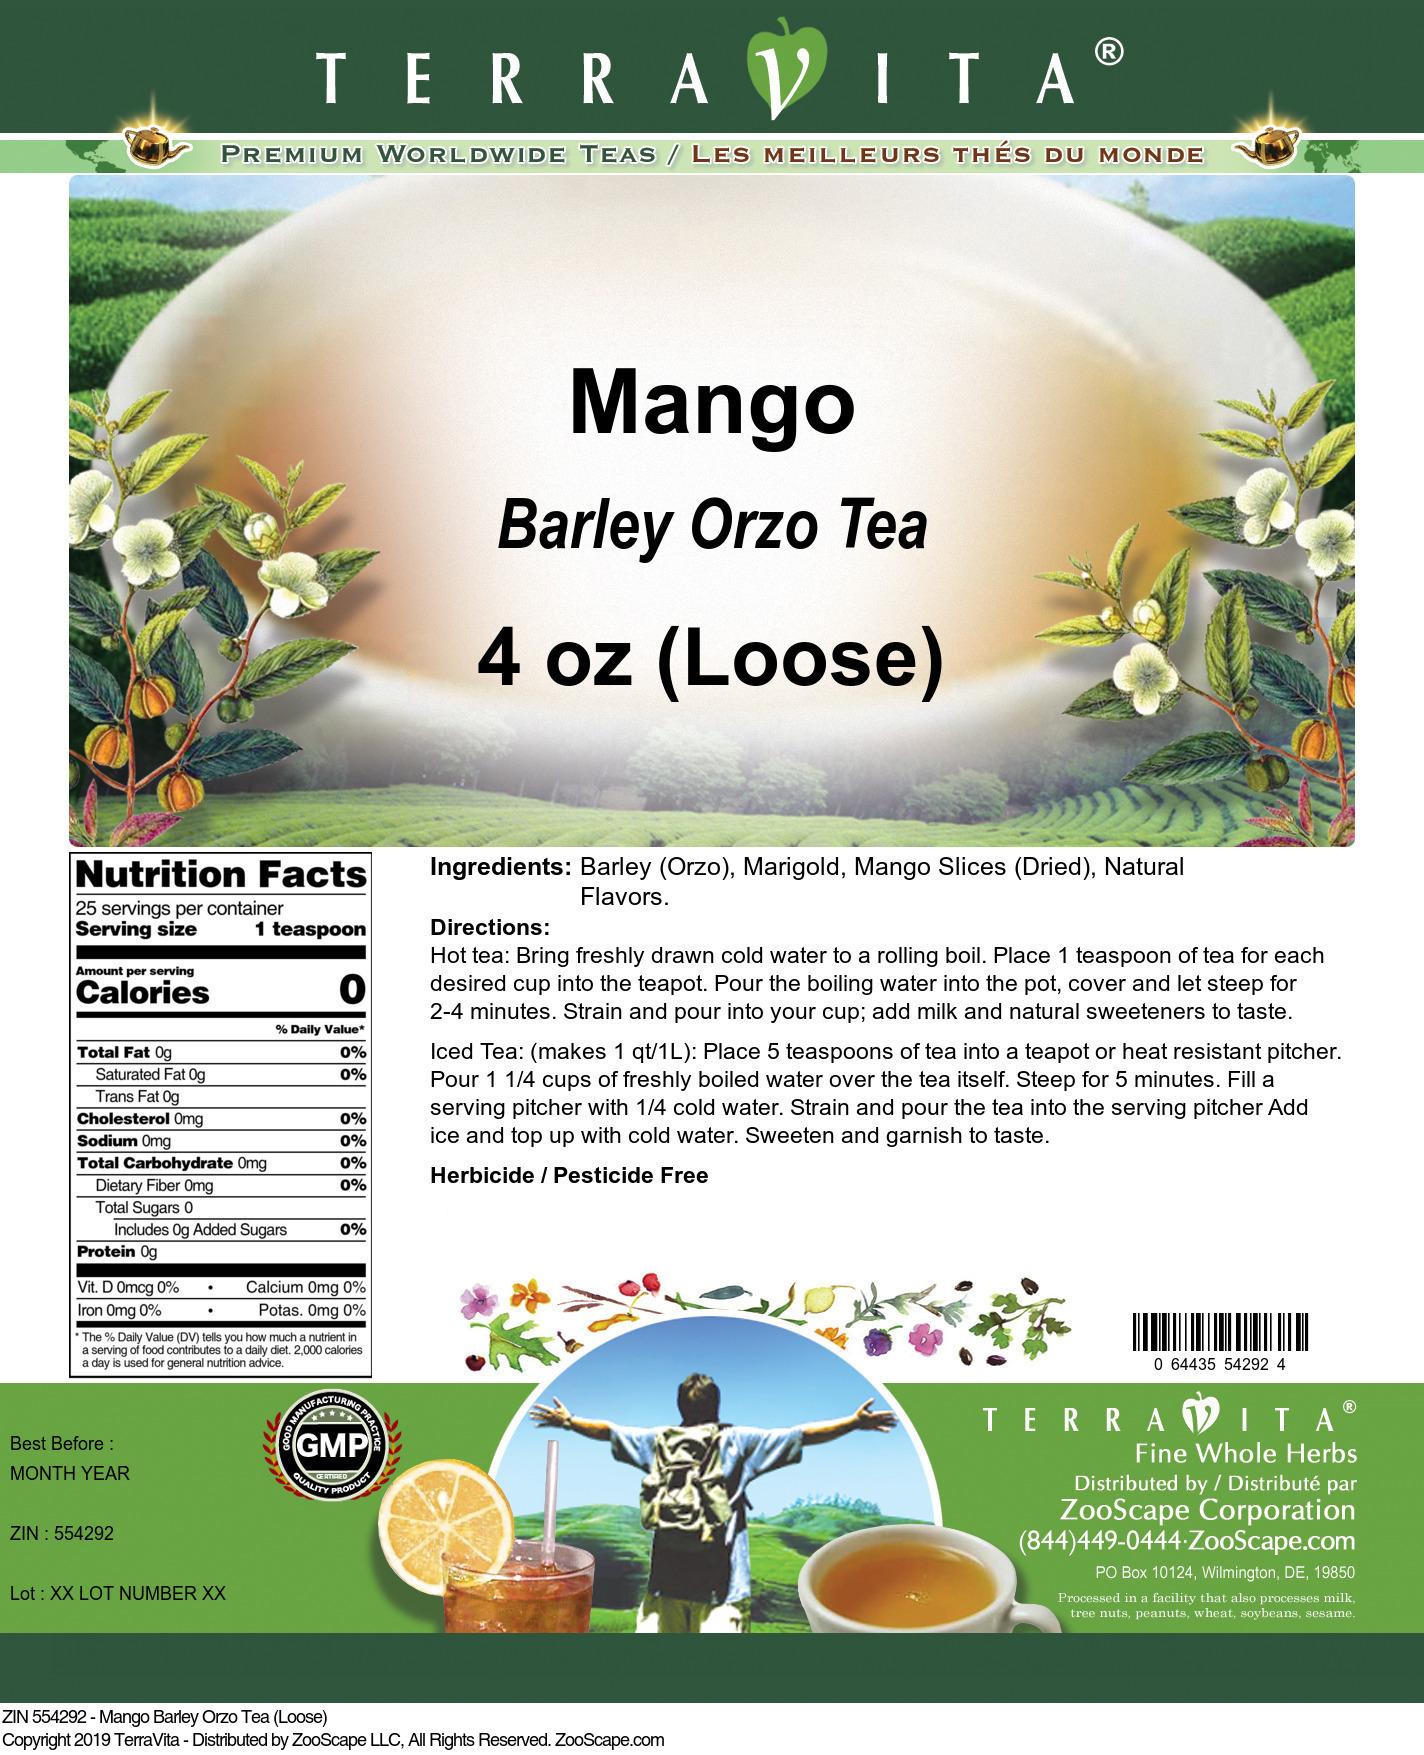 Mango Barley Orzo